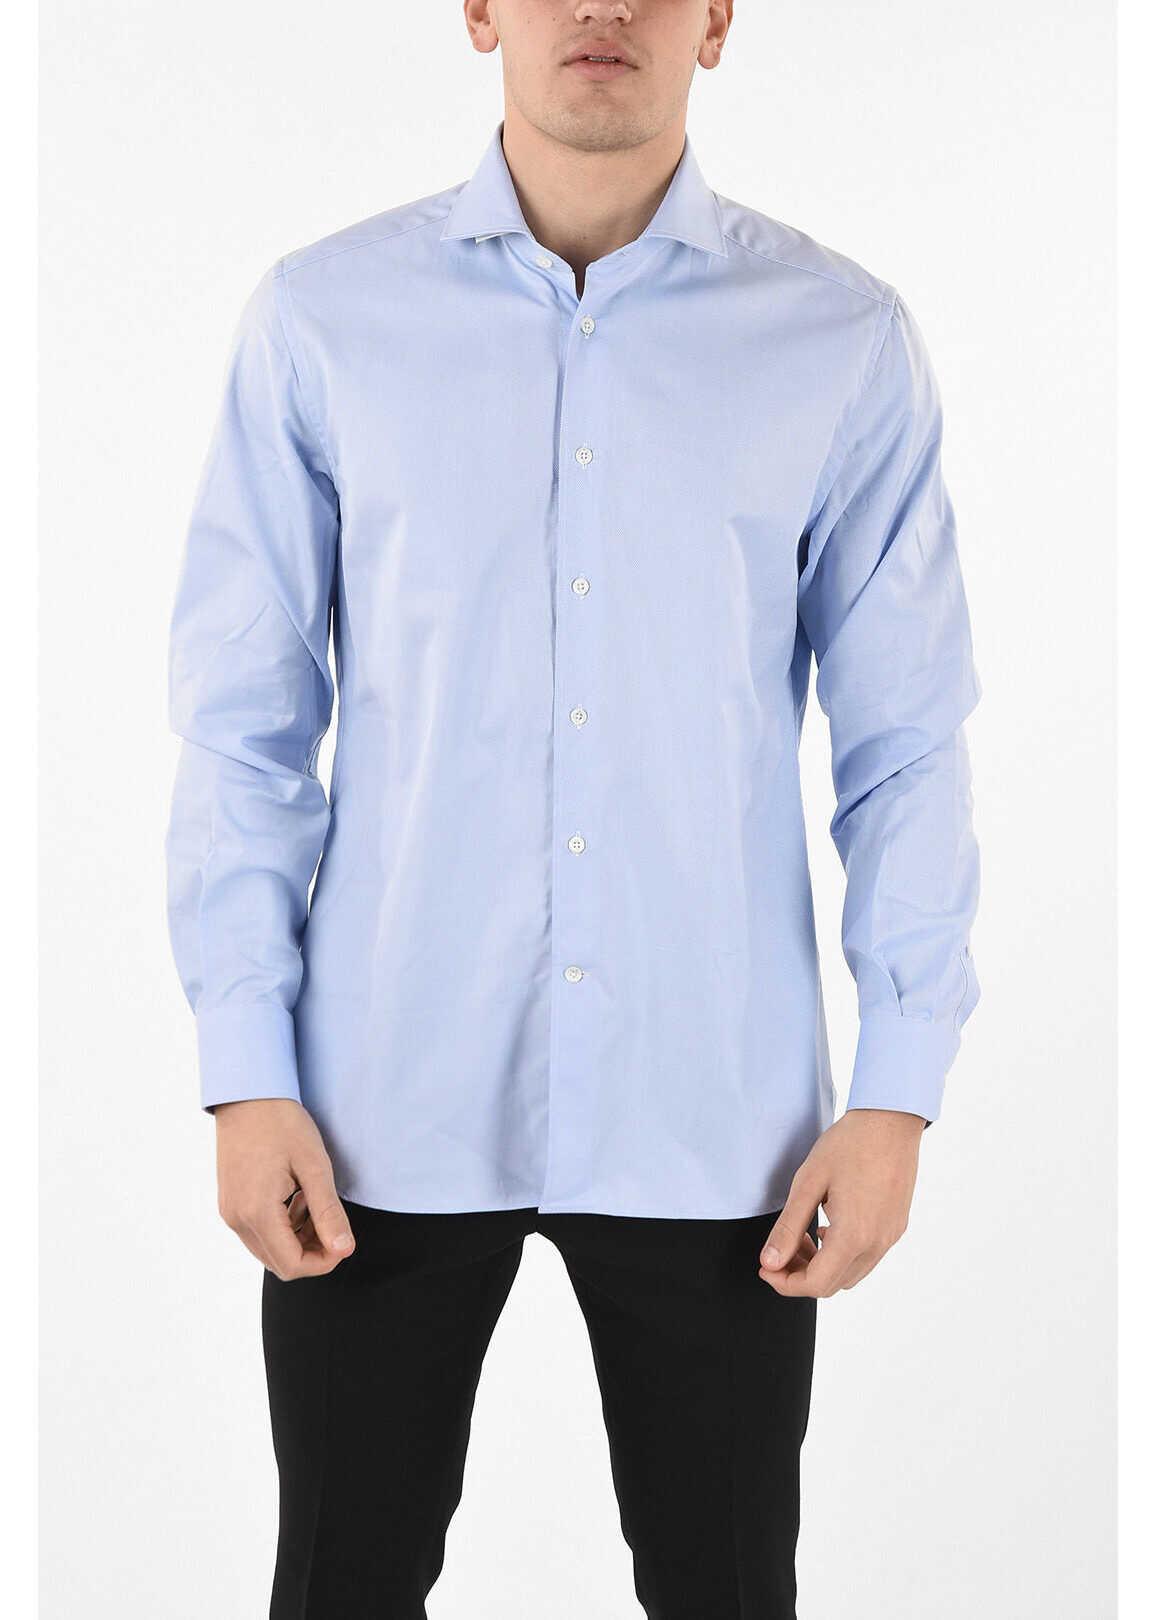 CORNELIANI spread collar shirt LIGHT BLUE imagine